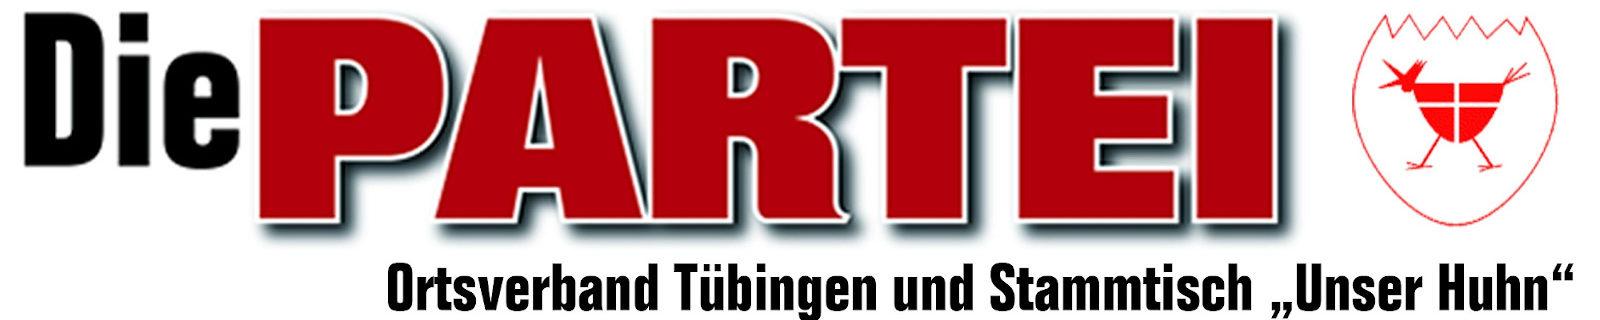 Die PARTEI Tübingen